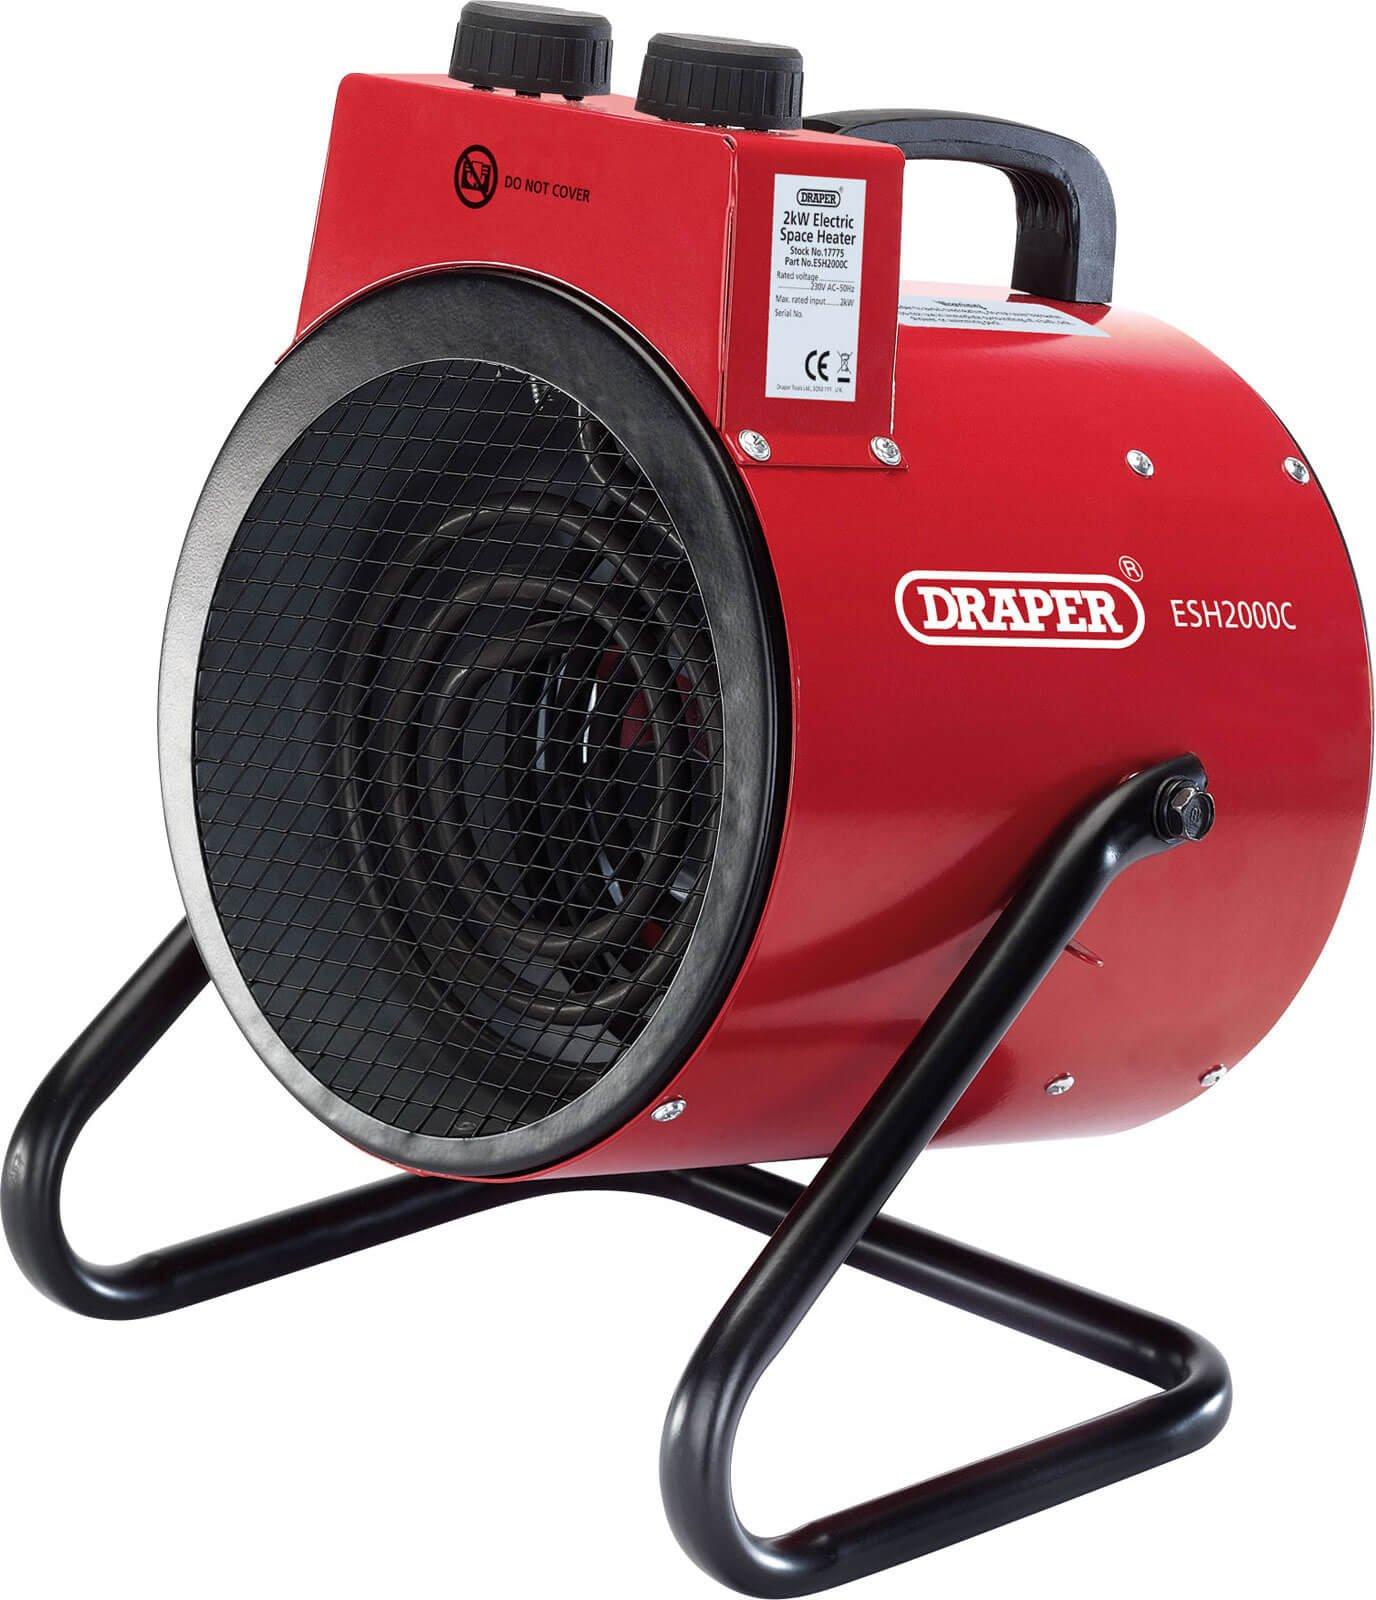 Draper ESH2000C 2Kw Space Heater 240v